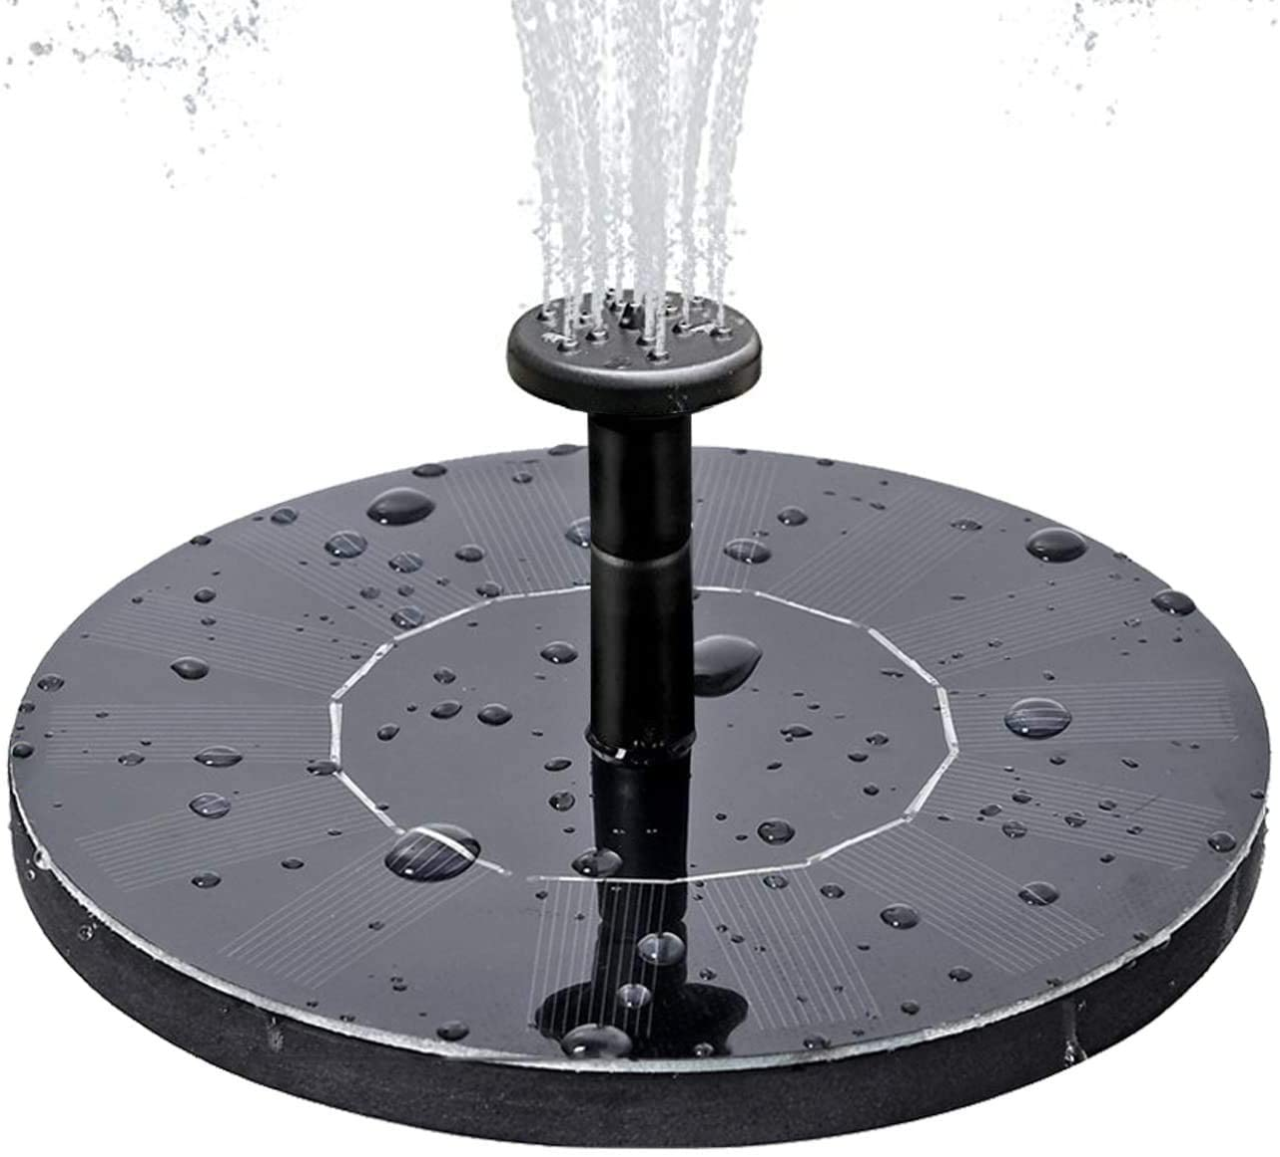 Solar Max 72% OFF Fountain Pump Free Standing Birdbath 2018 Sales